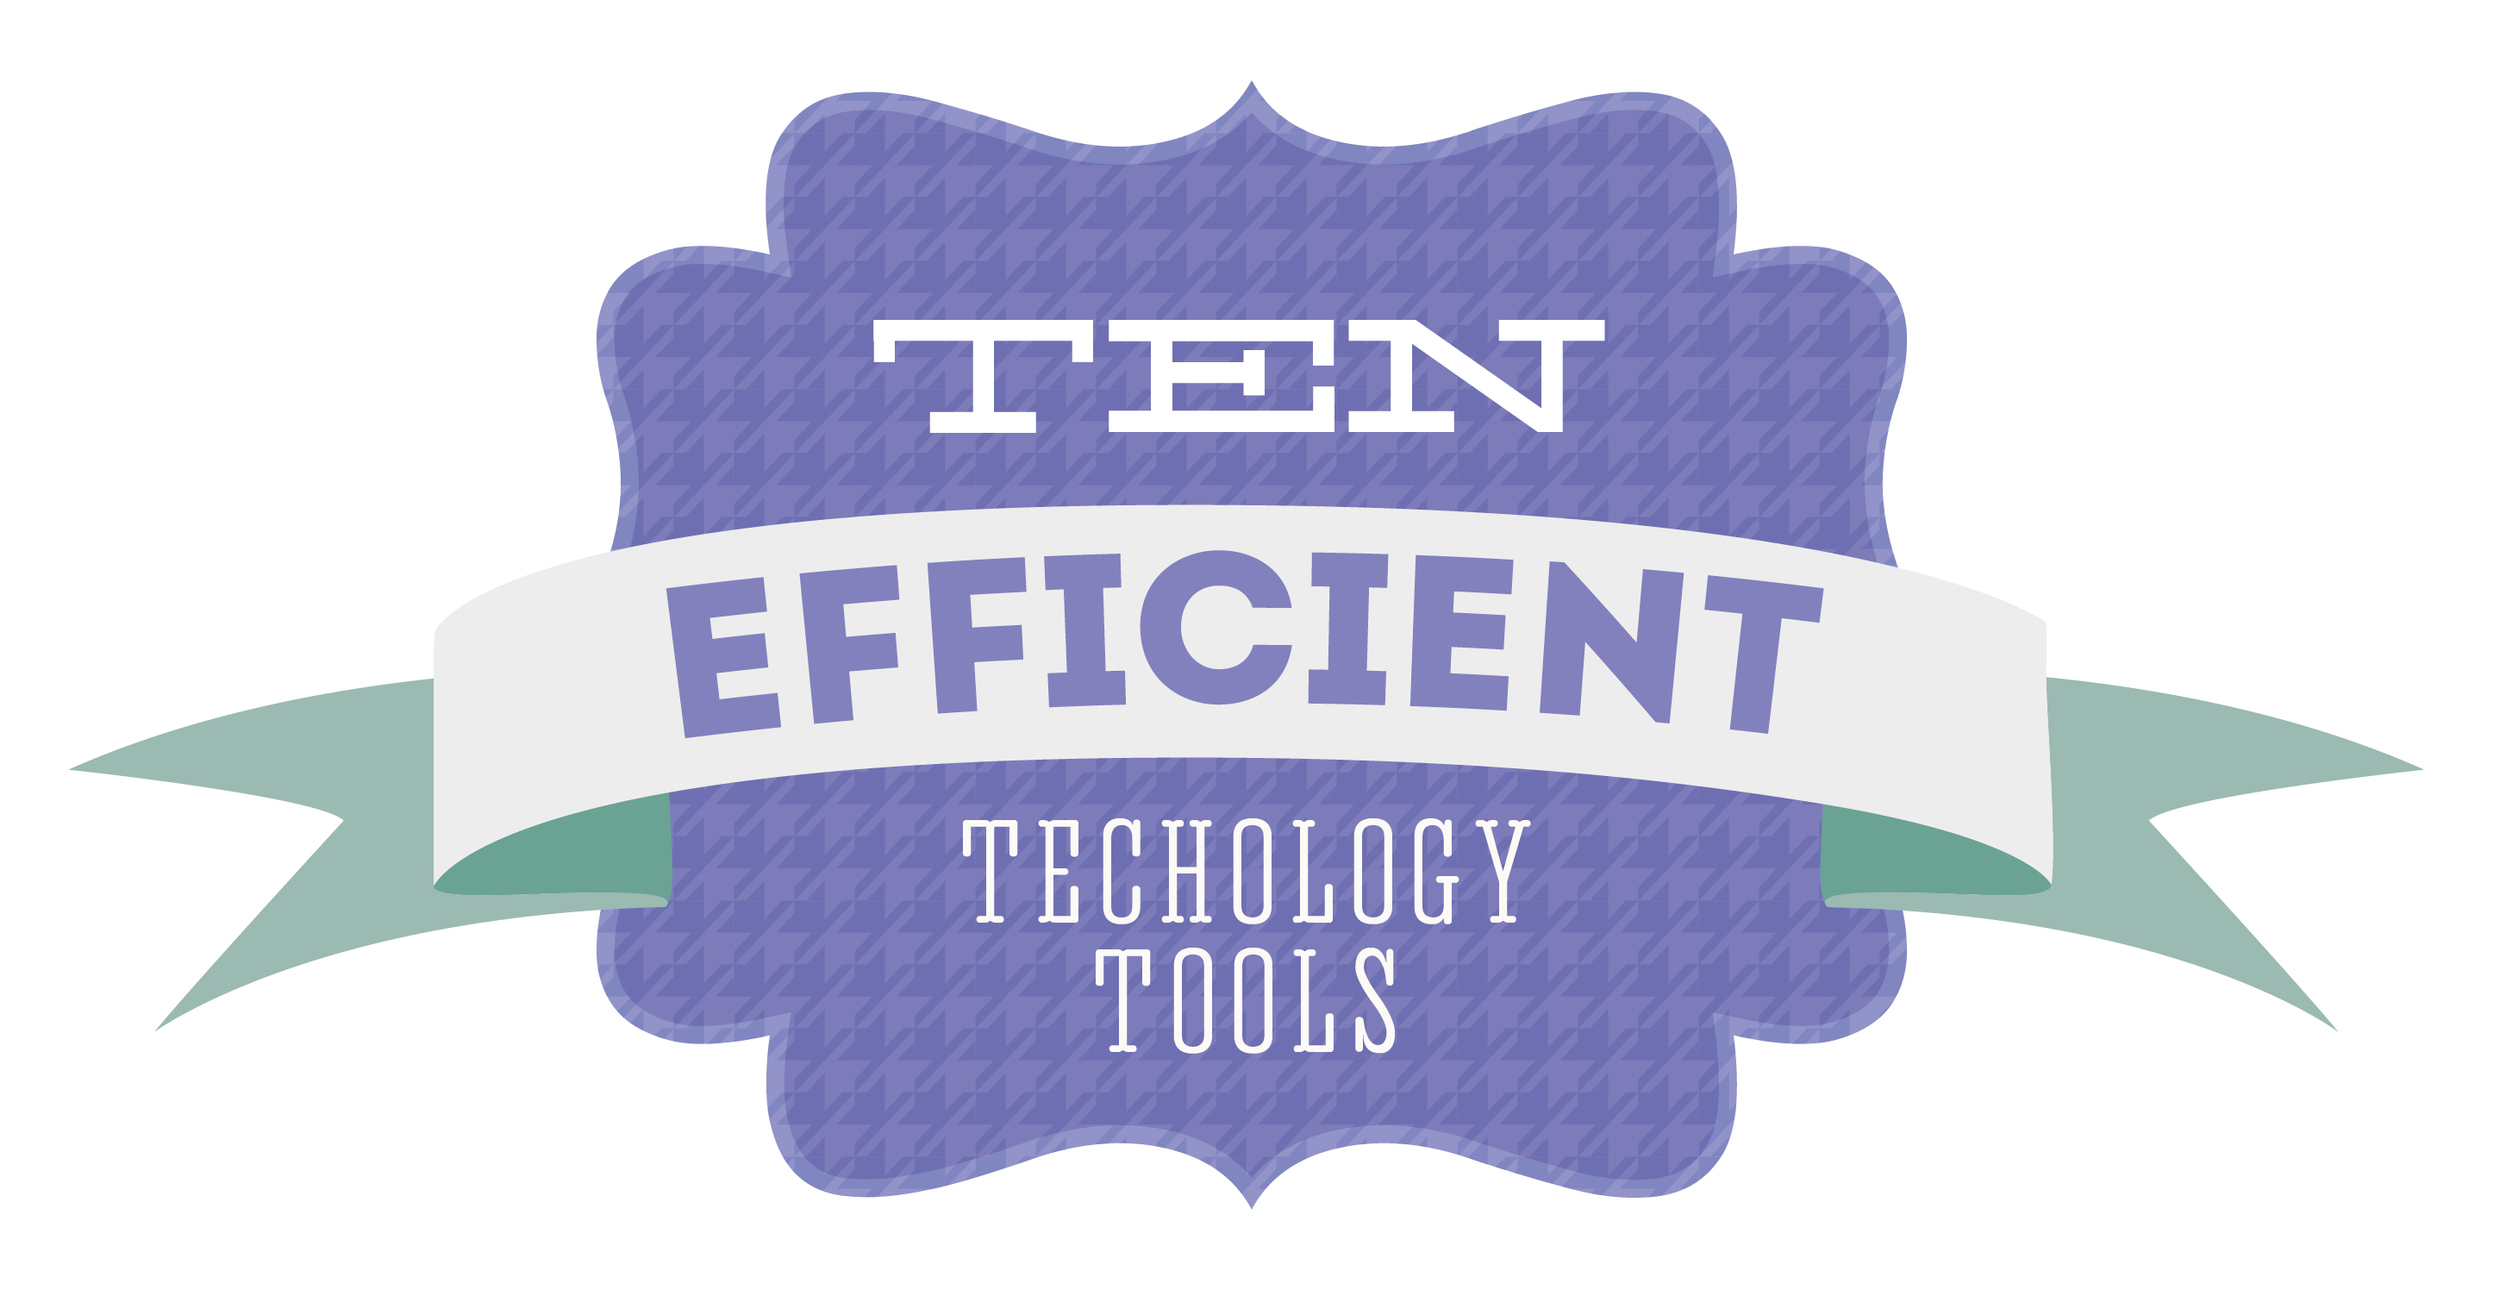 Ten Efficient Technology Tools